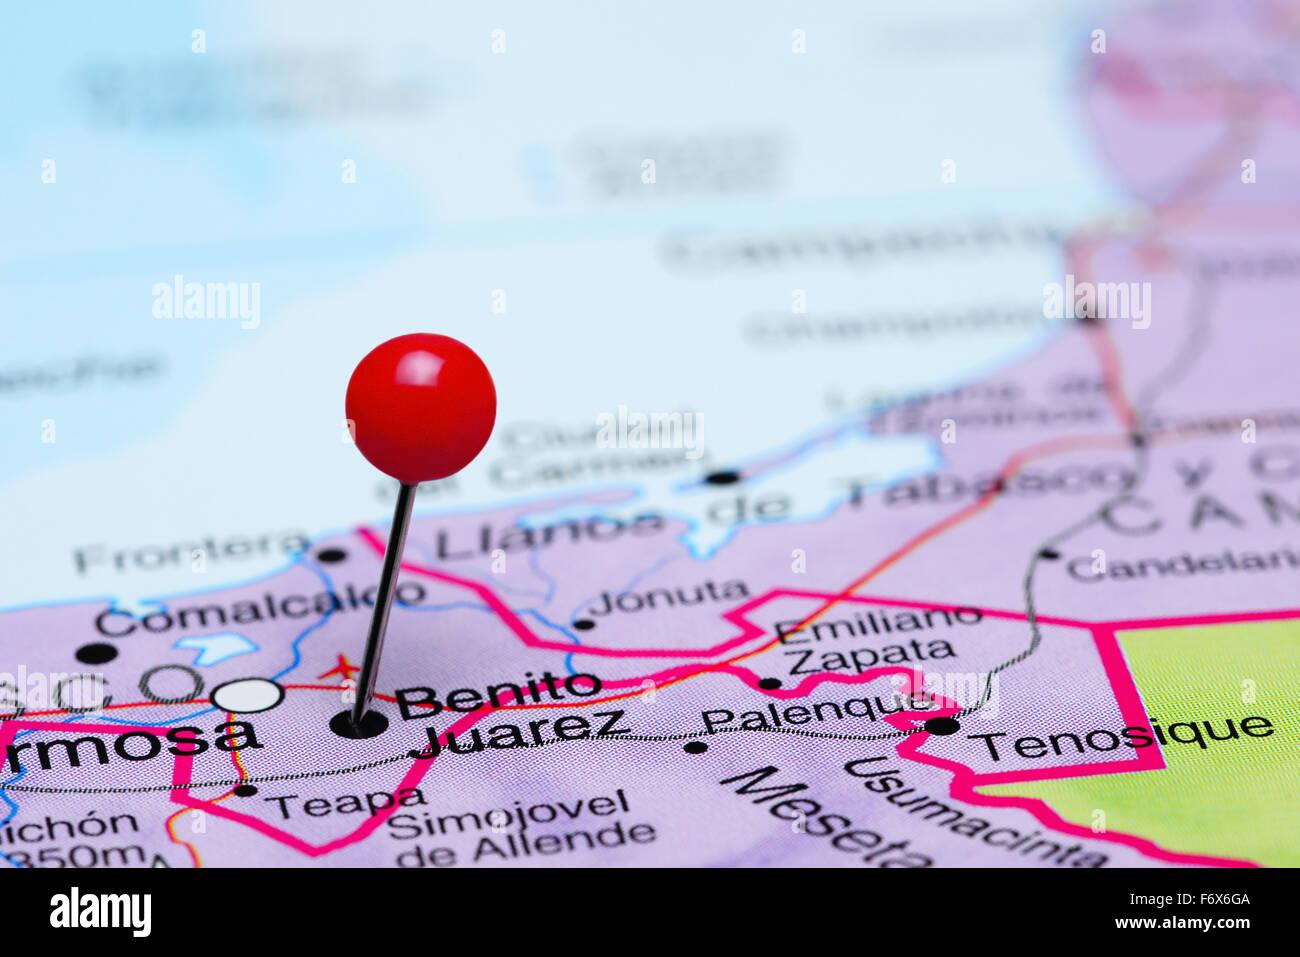 Benito Juarez Pinned On A Map Of Mexico Stock Photo 90315690 Alamy